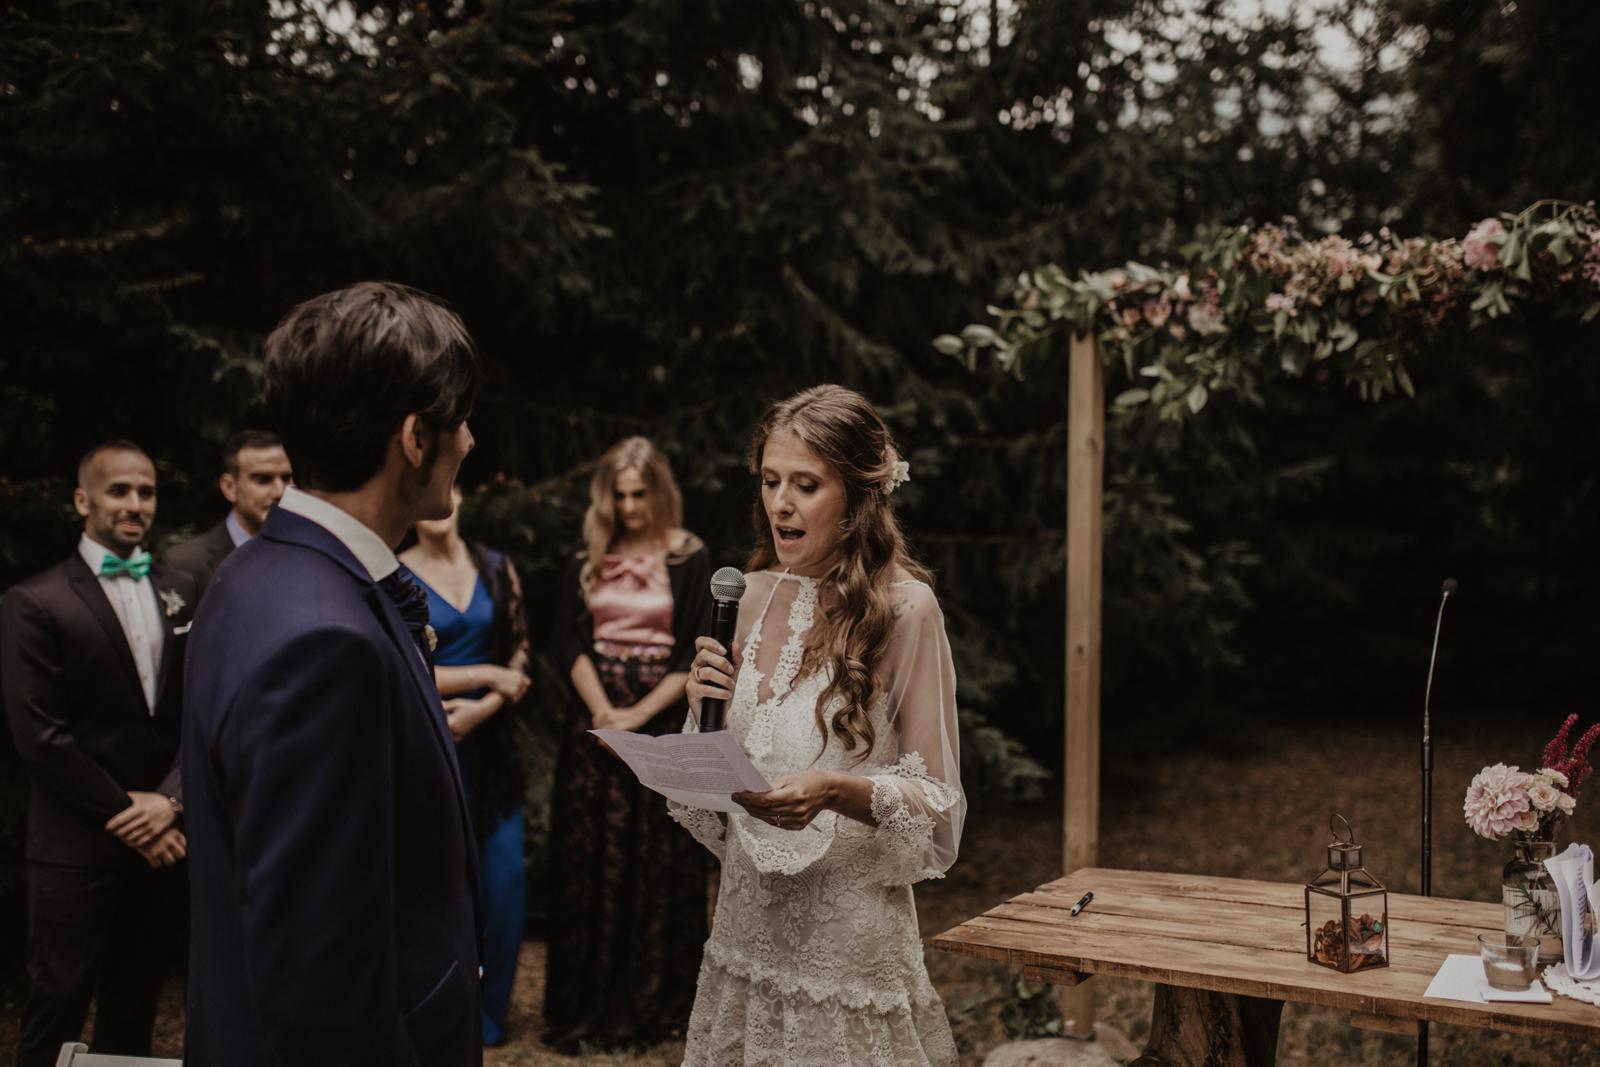 thenortherngirlphotography_photography_thenortherngirl_rebeccascabros_wedding_weddingphotography_weddingphotographer_barcelona_bodaenbarcelona_bodaenmaselmarti_bodarogeryvane-448.jpg